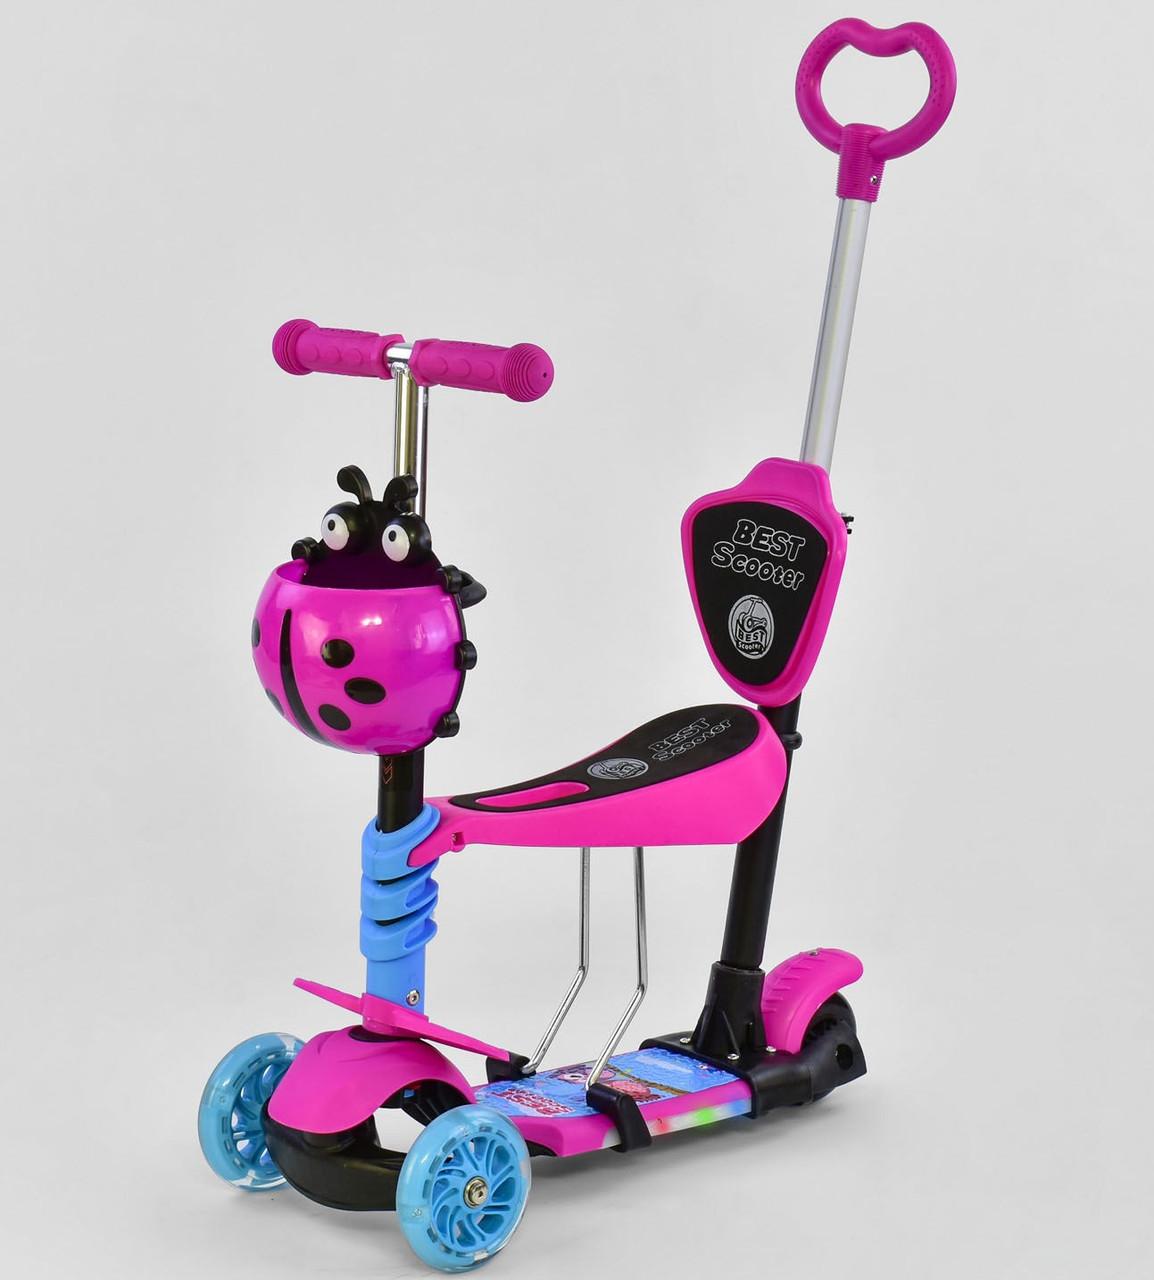 Самокат Best scooter 5 в 1 с  подножками